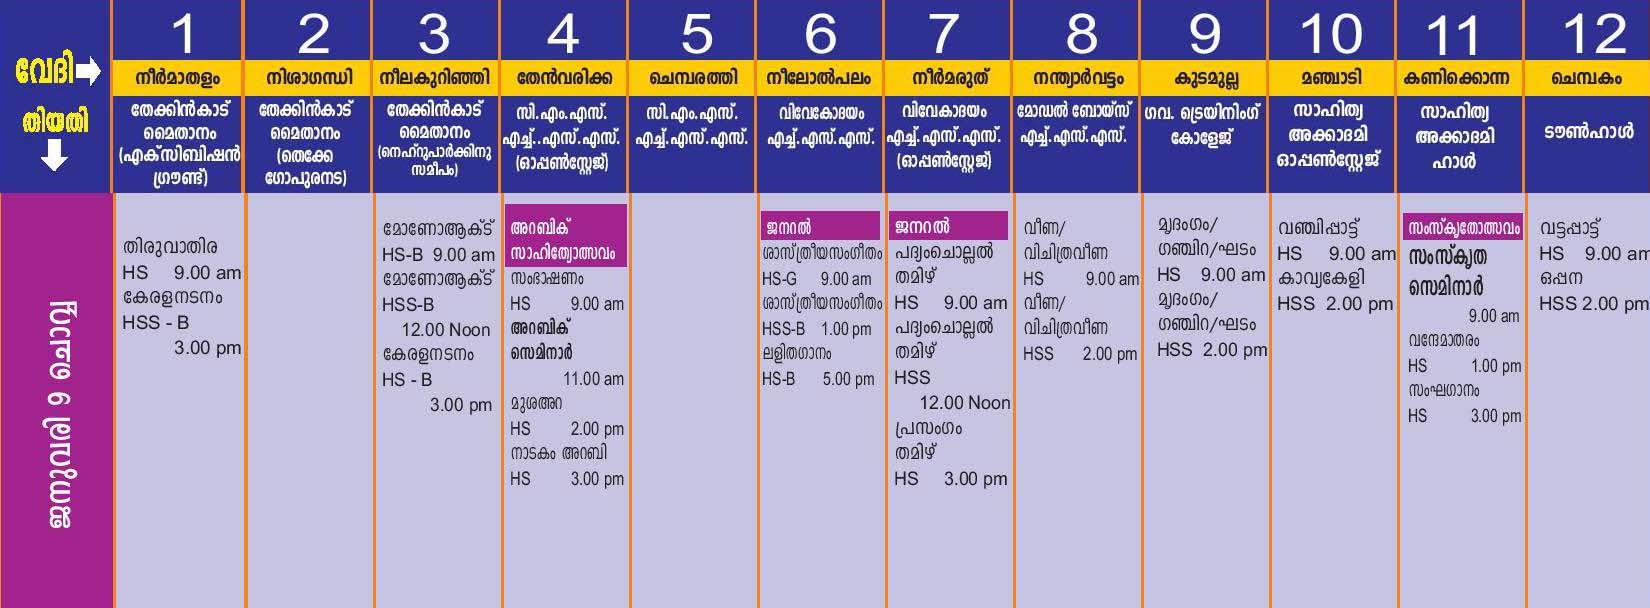 Kerala school kalolsavam 2018 Thrissur schedule programme chart image